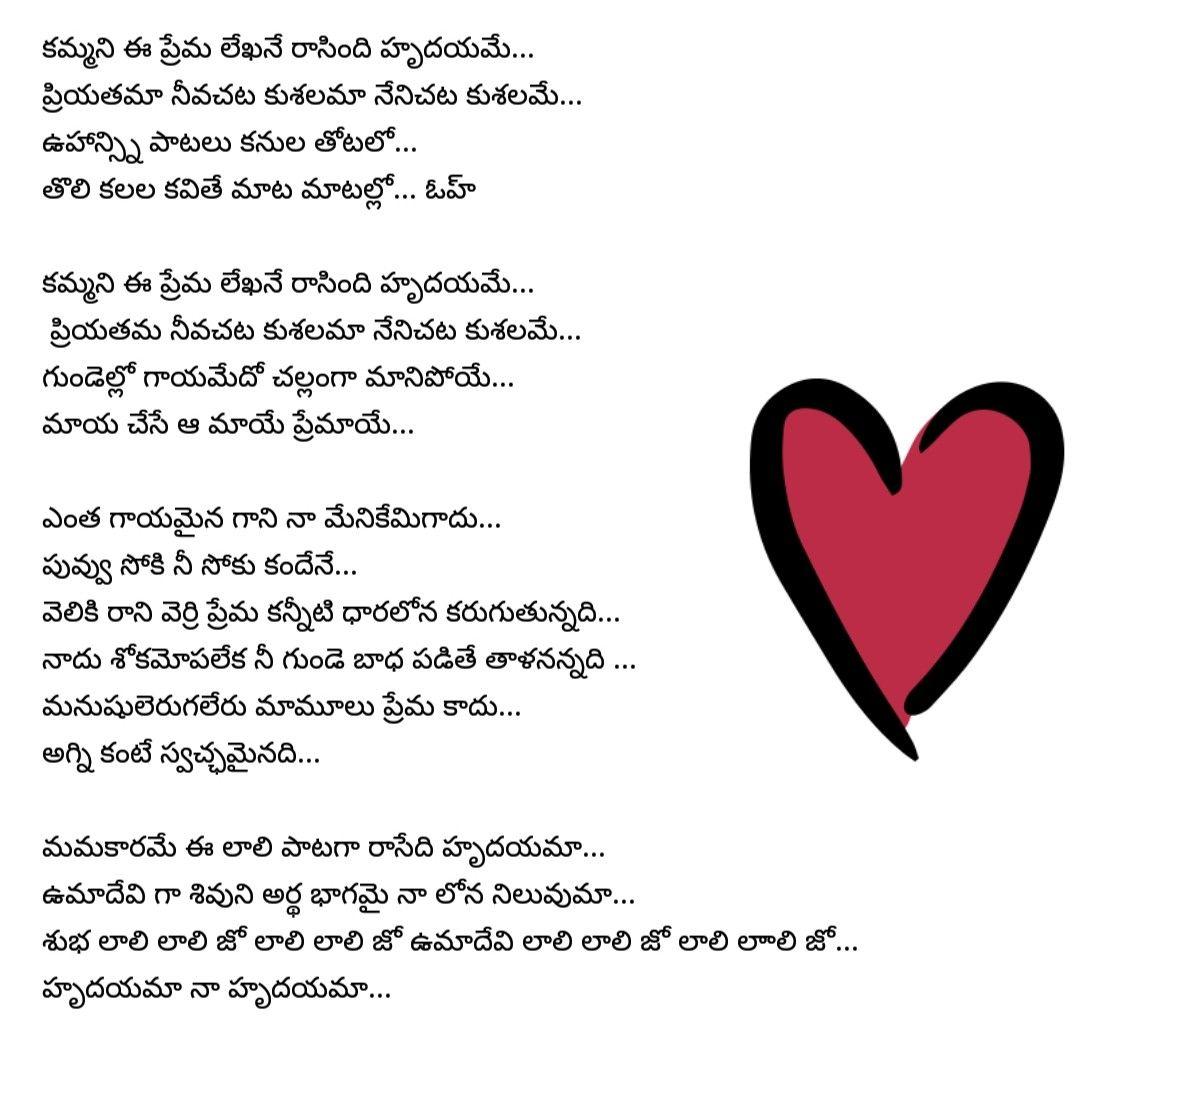 Kammani Ee Premalekha Song Lyrics From Yeto Vellipoyindi Manasu Writing Quotes Inspirational Song Lyrics Bhakti Song